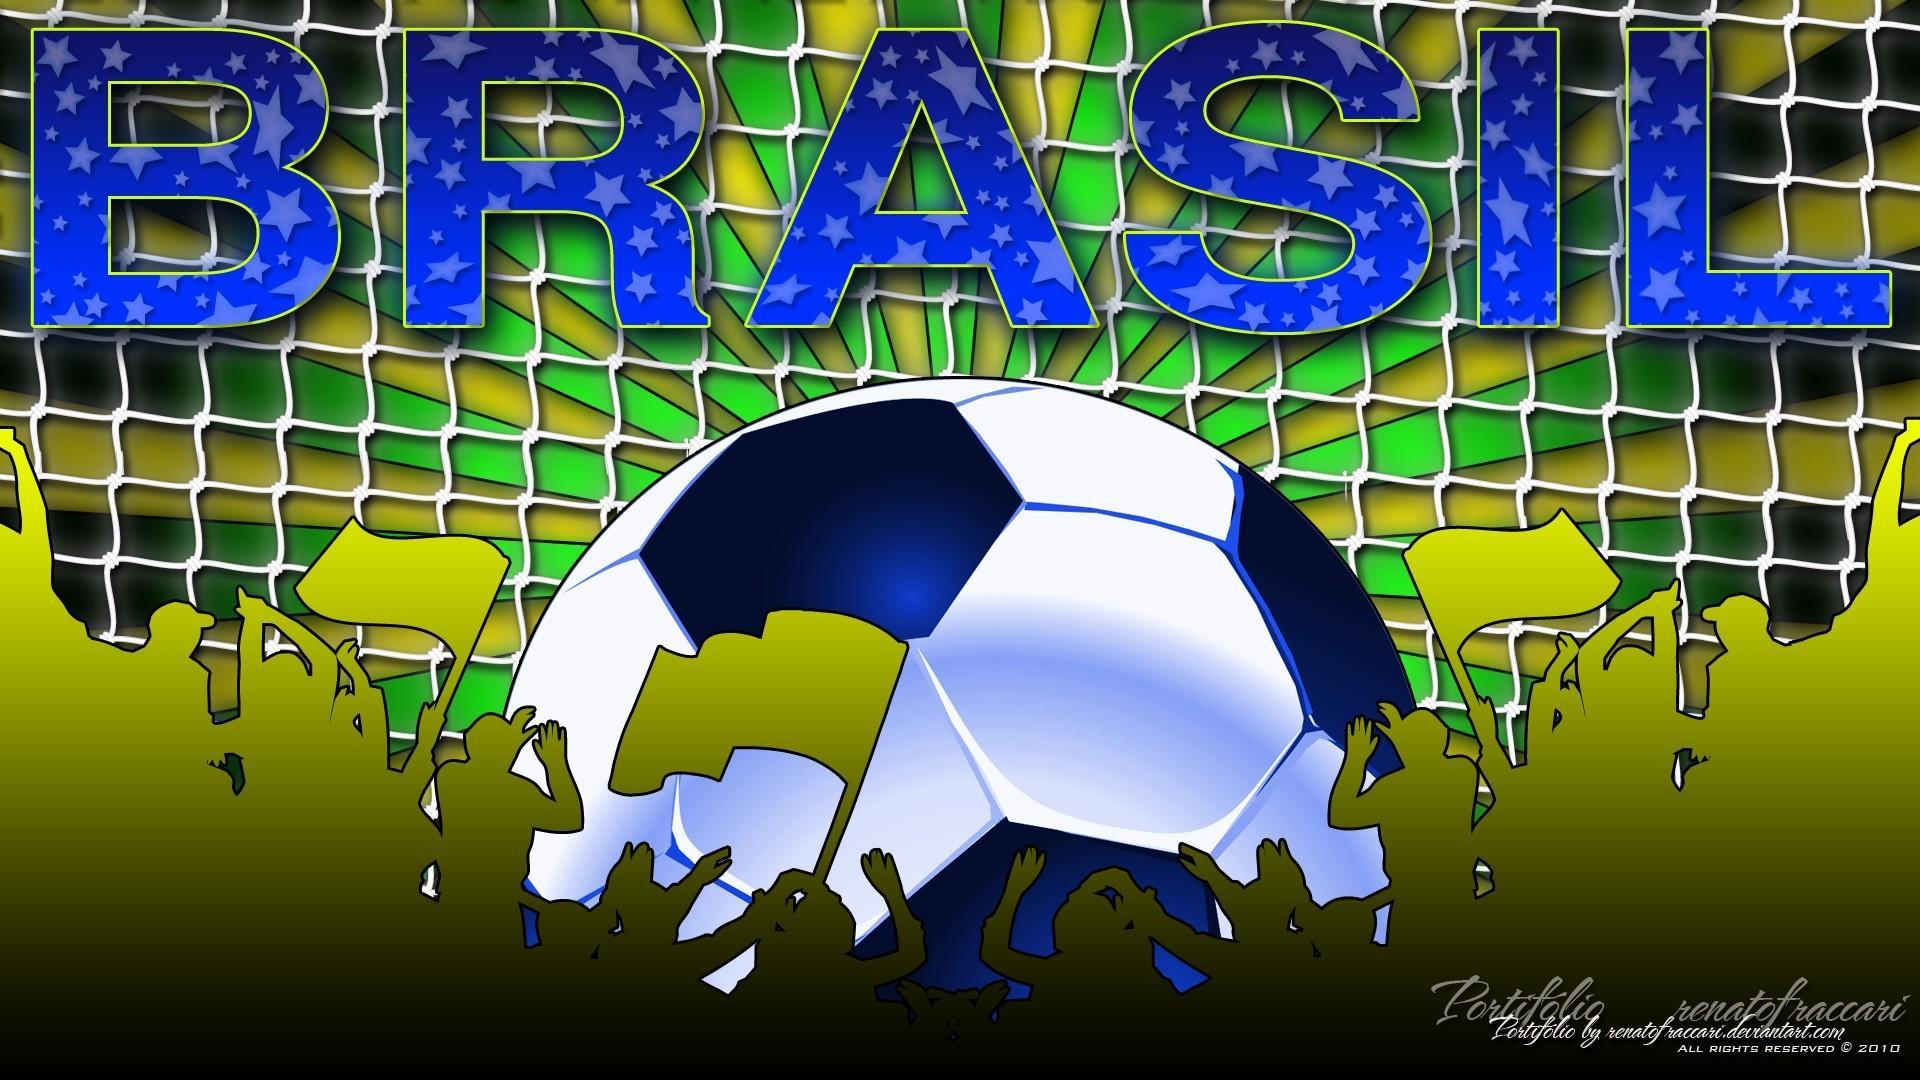 Brazil soccer cbf football logos gol wallpaper 75873 1920x1080